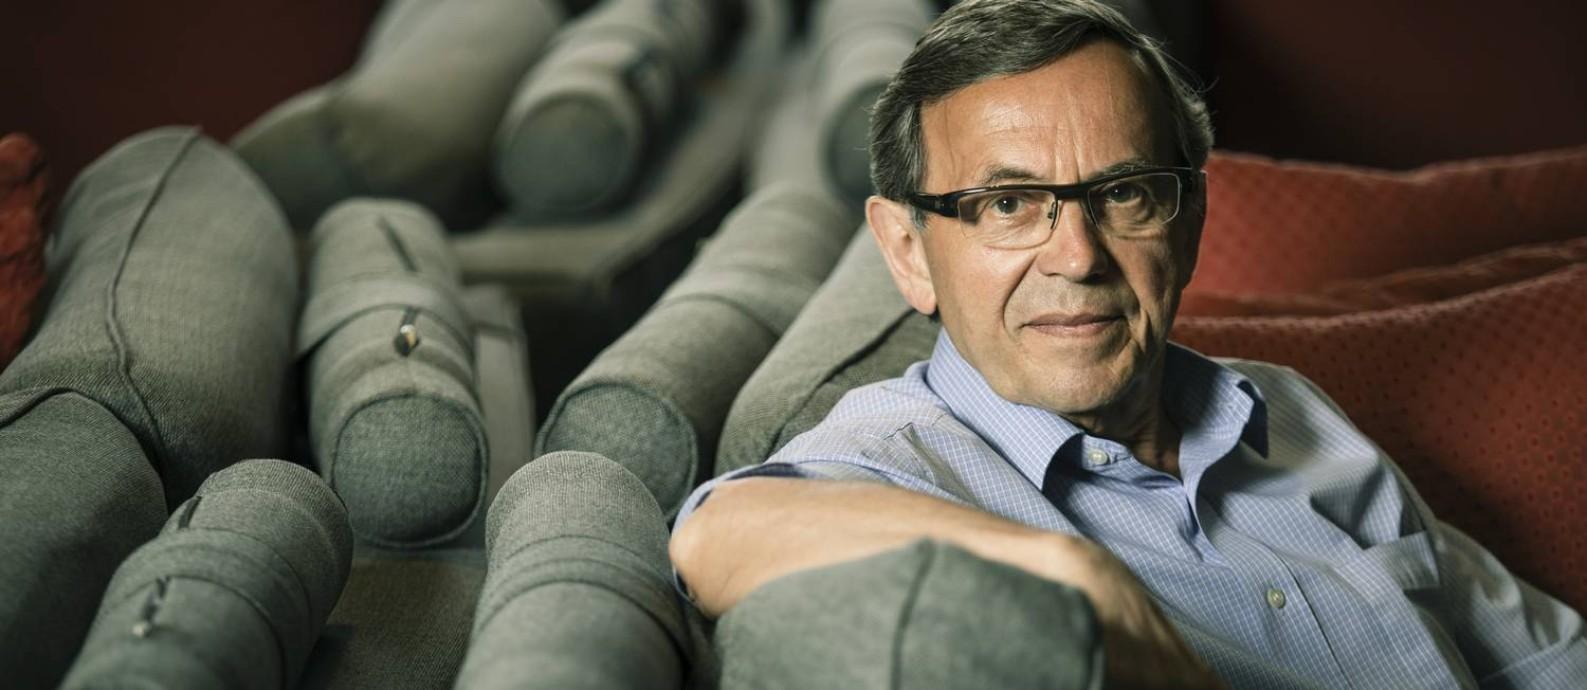 O historiador francês Jean-Yves Mollier Foto: Leo Martins / Agência O Globo